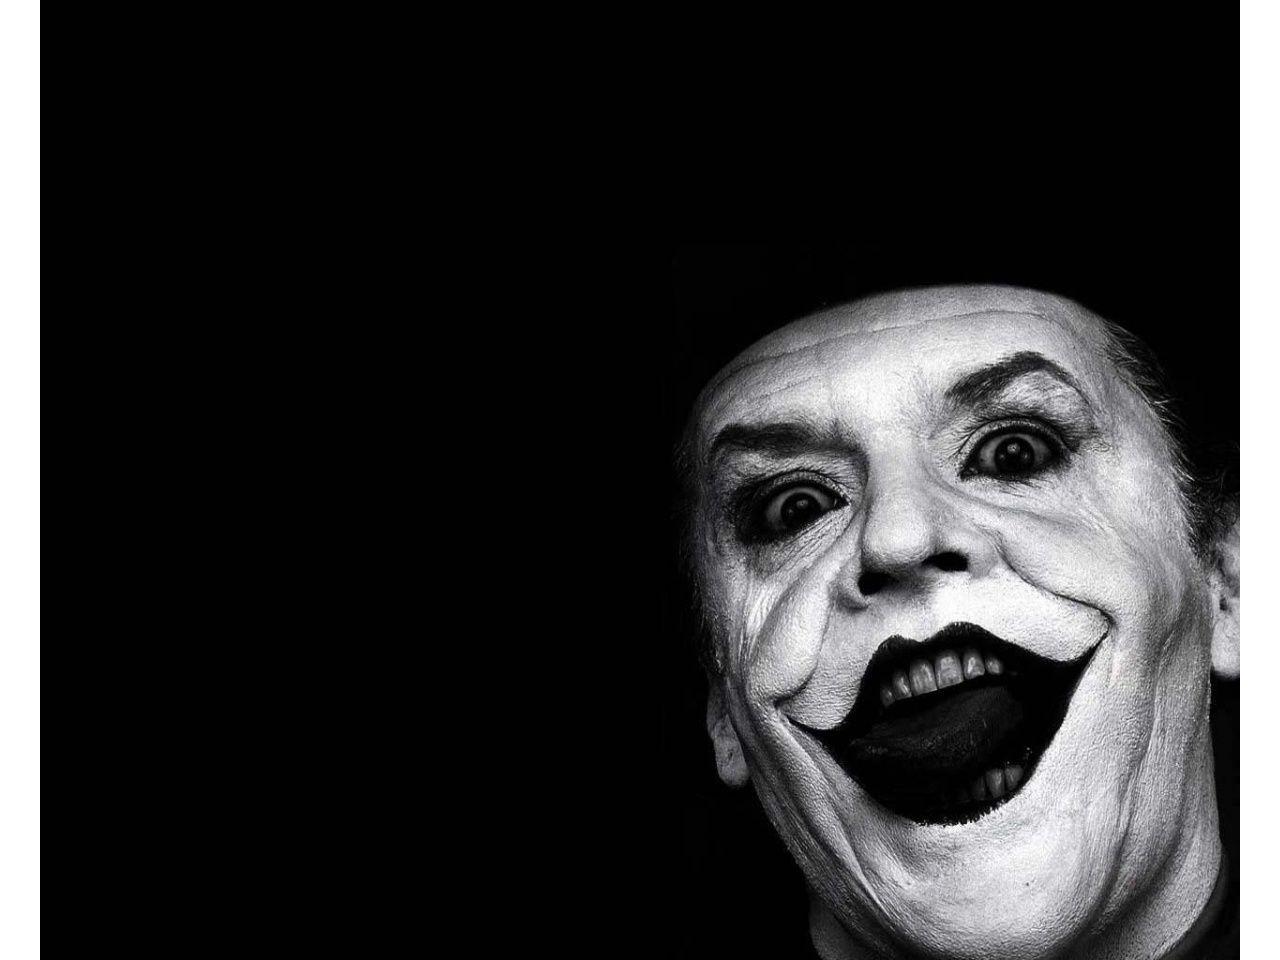 The Joker Jack Nicholson Wallpaper 1280x960